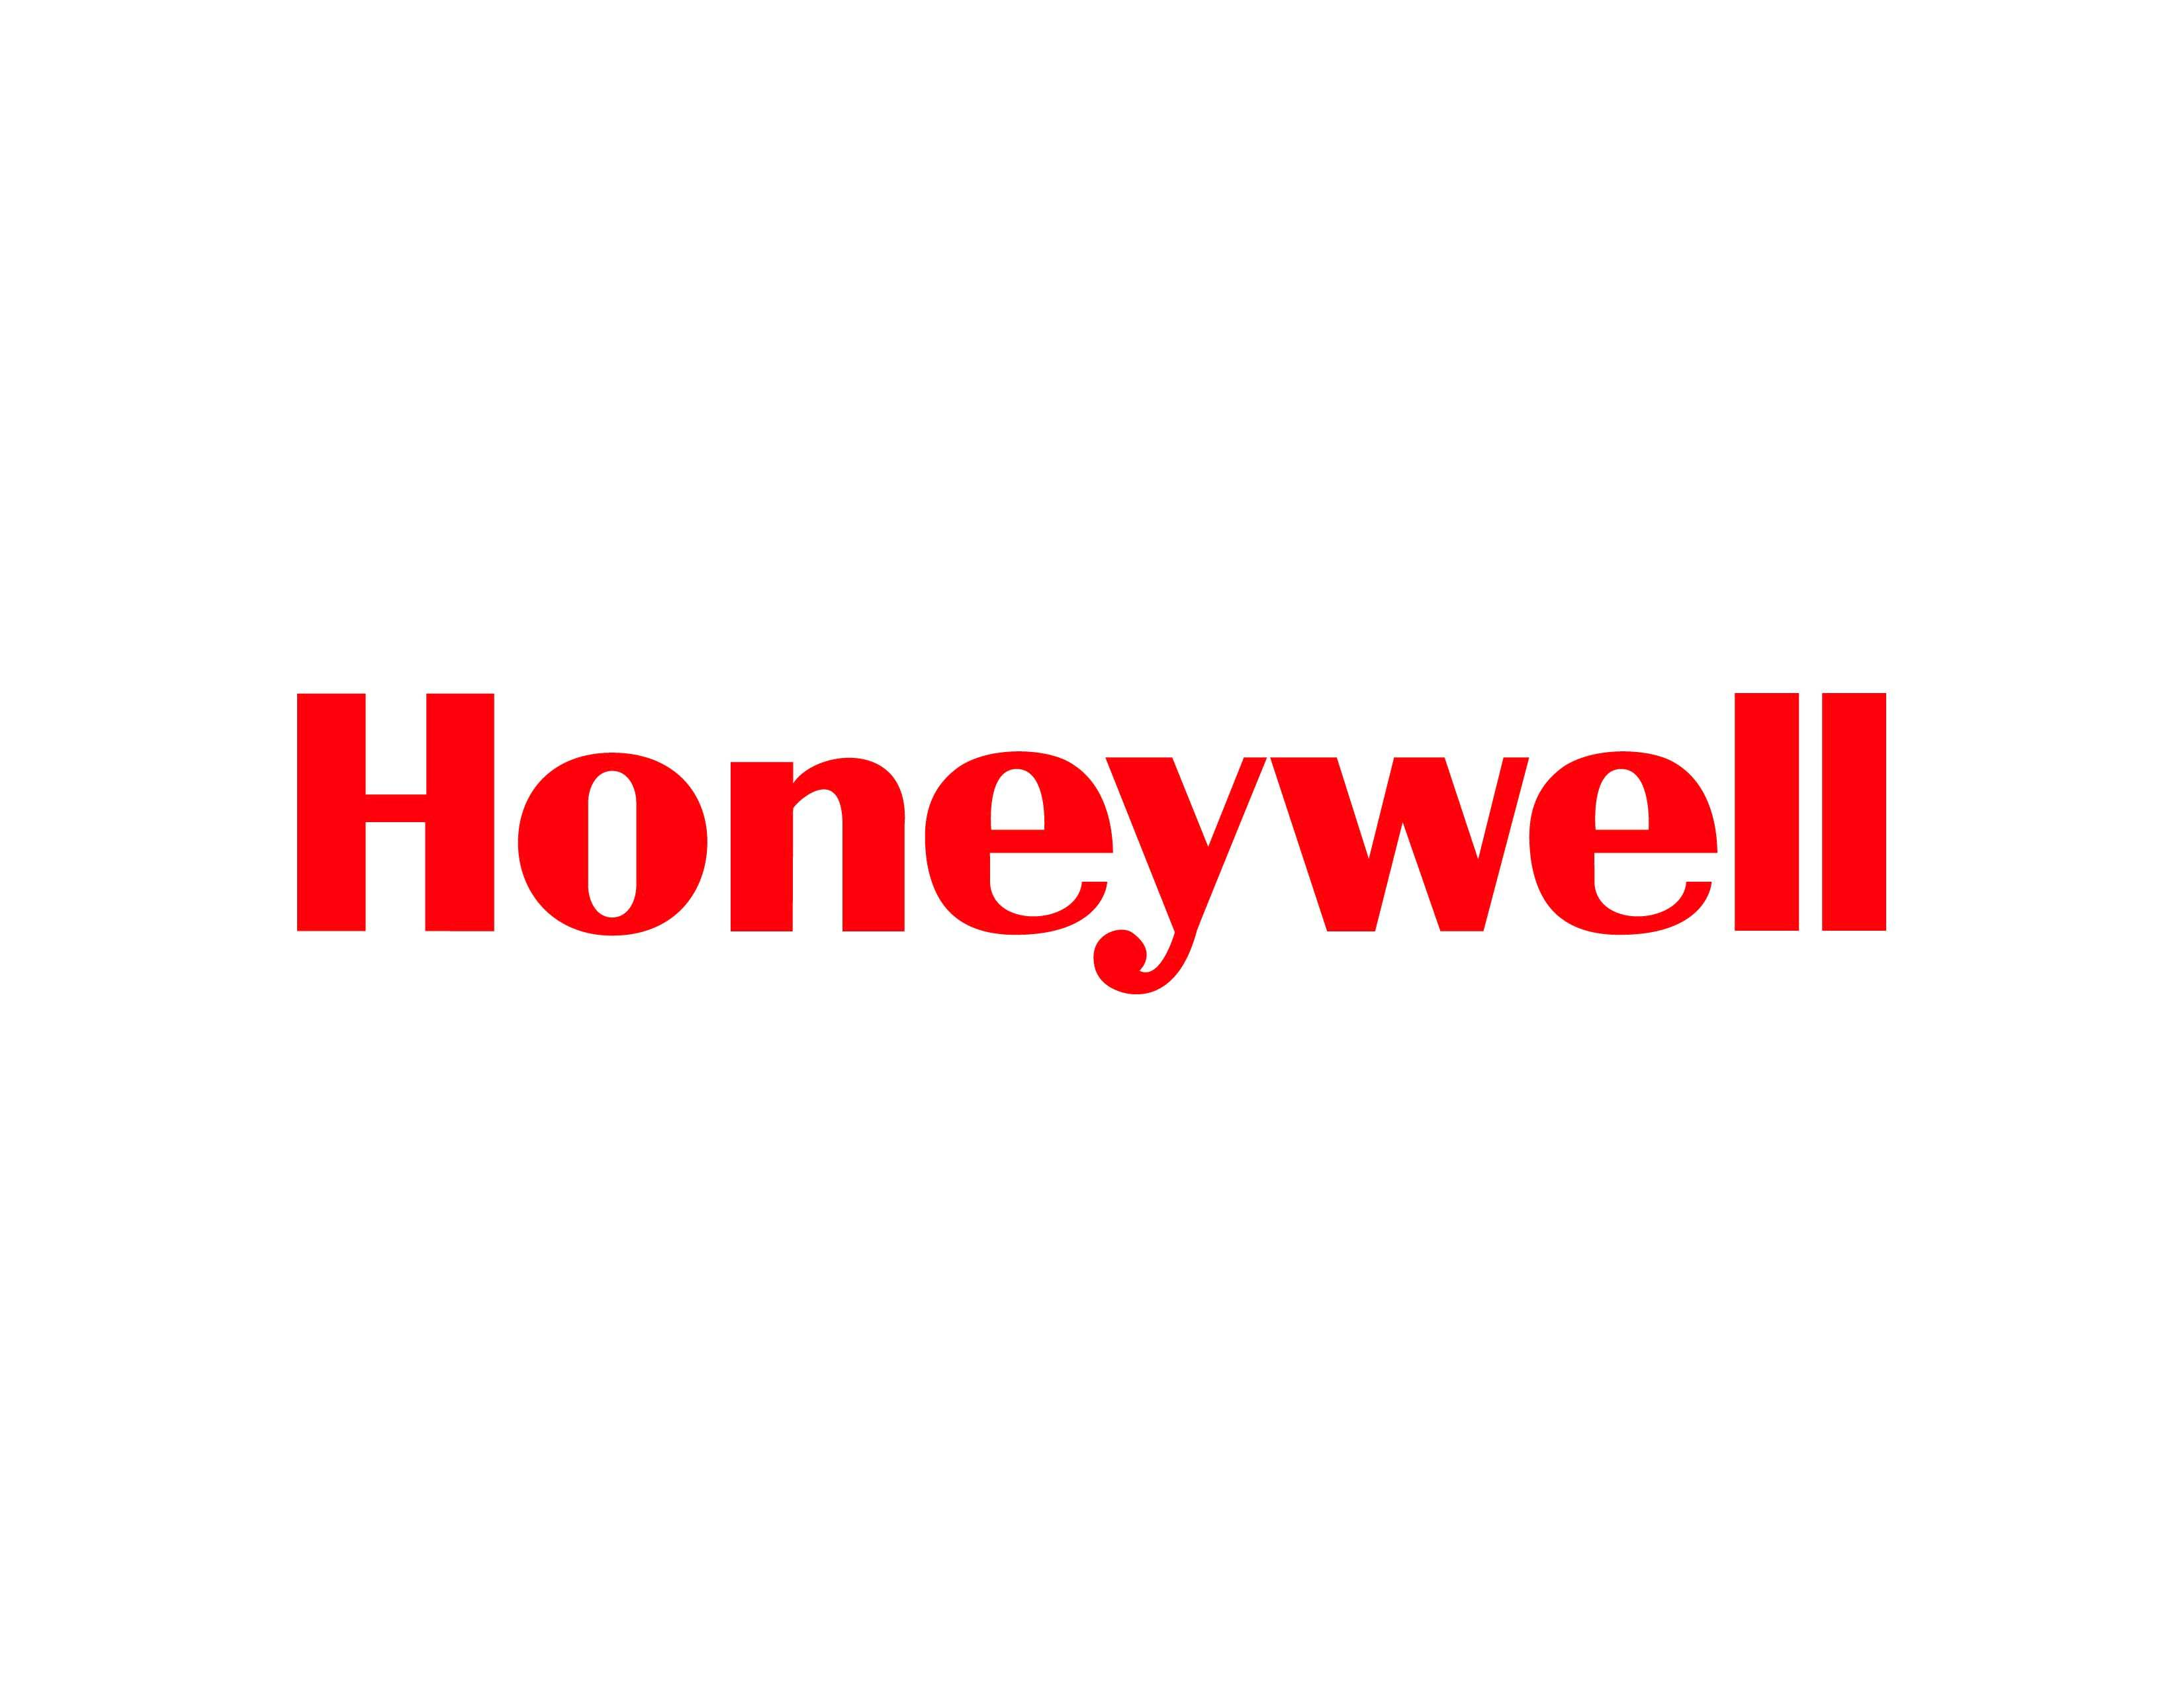 Honeywell-logo-large